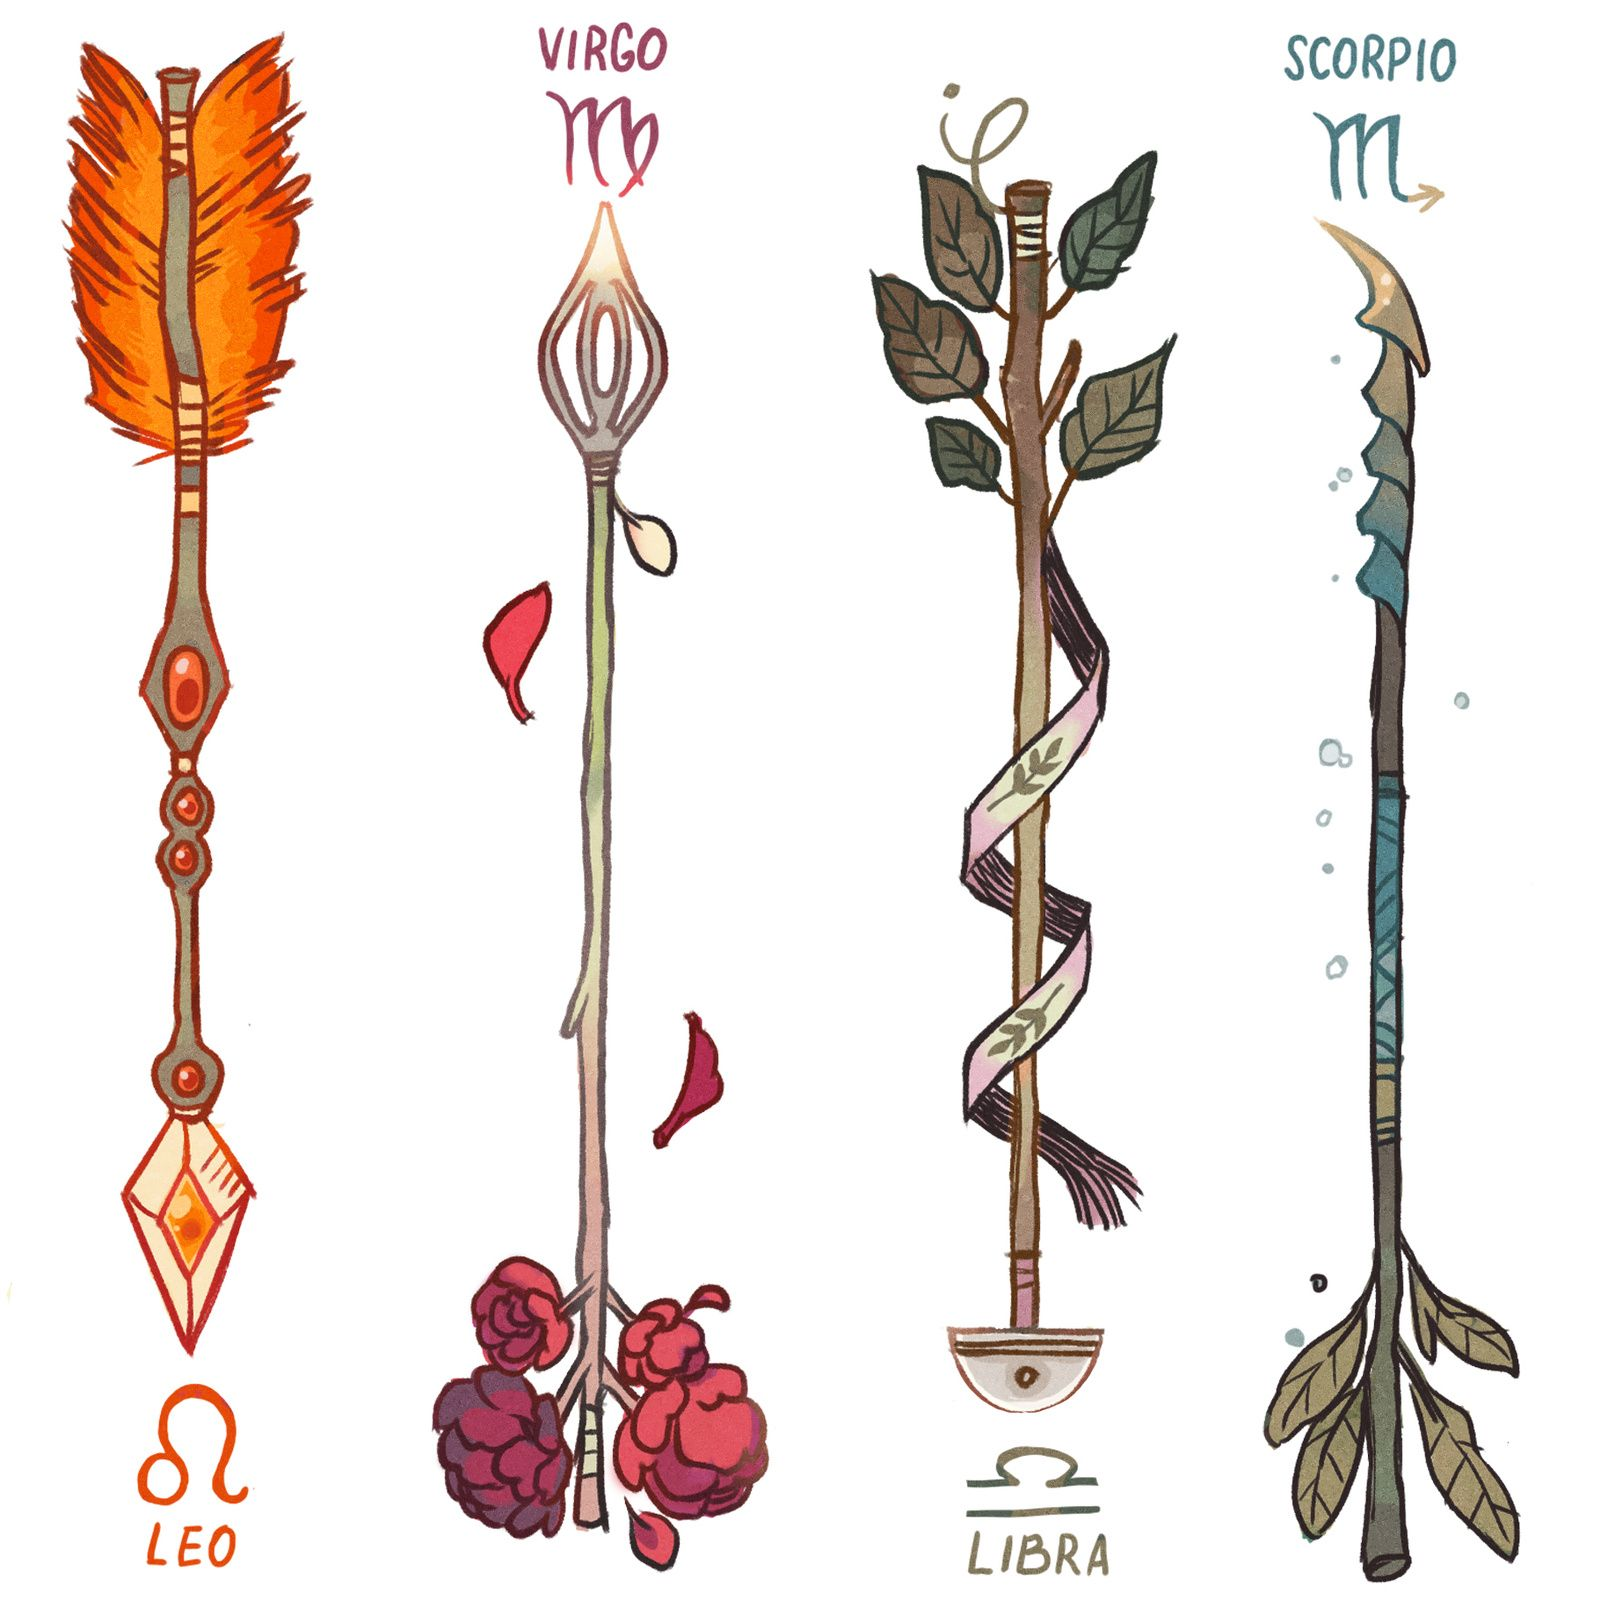 Virgo Zodiac Horoscope Tattoo Designs (206)